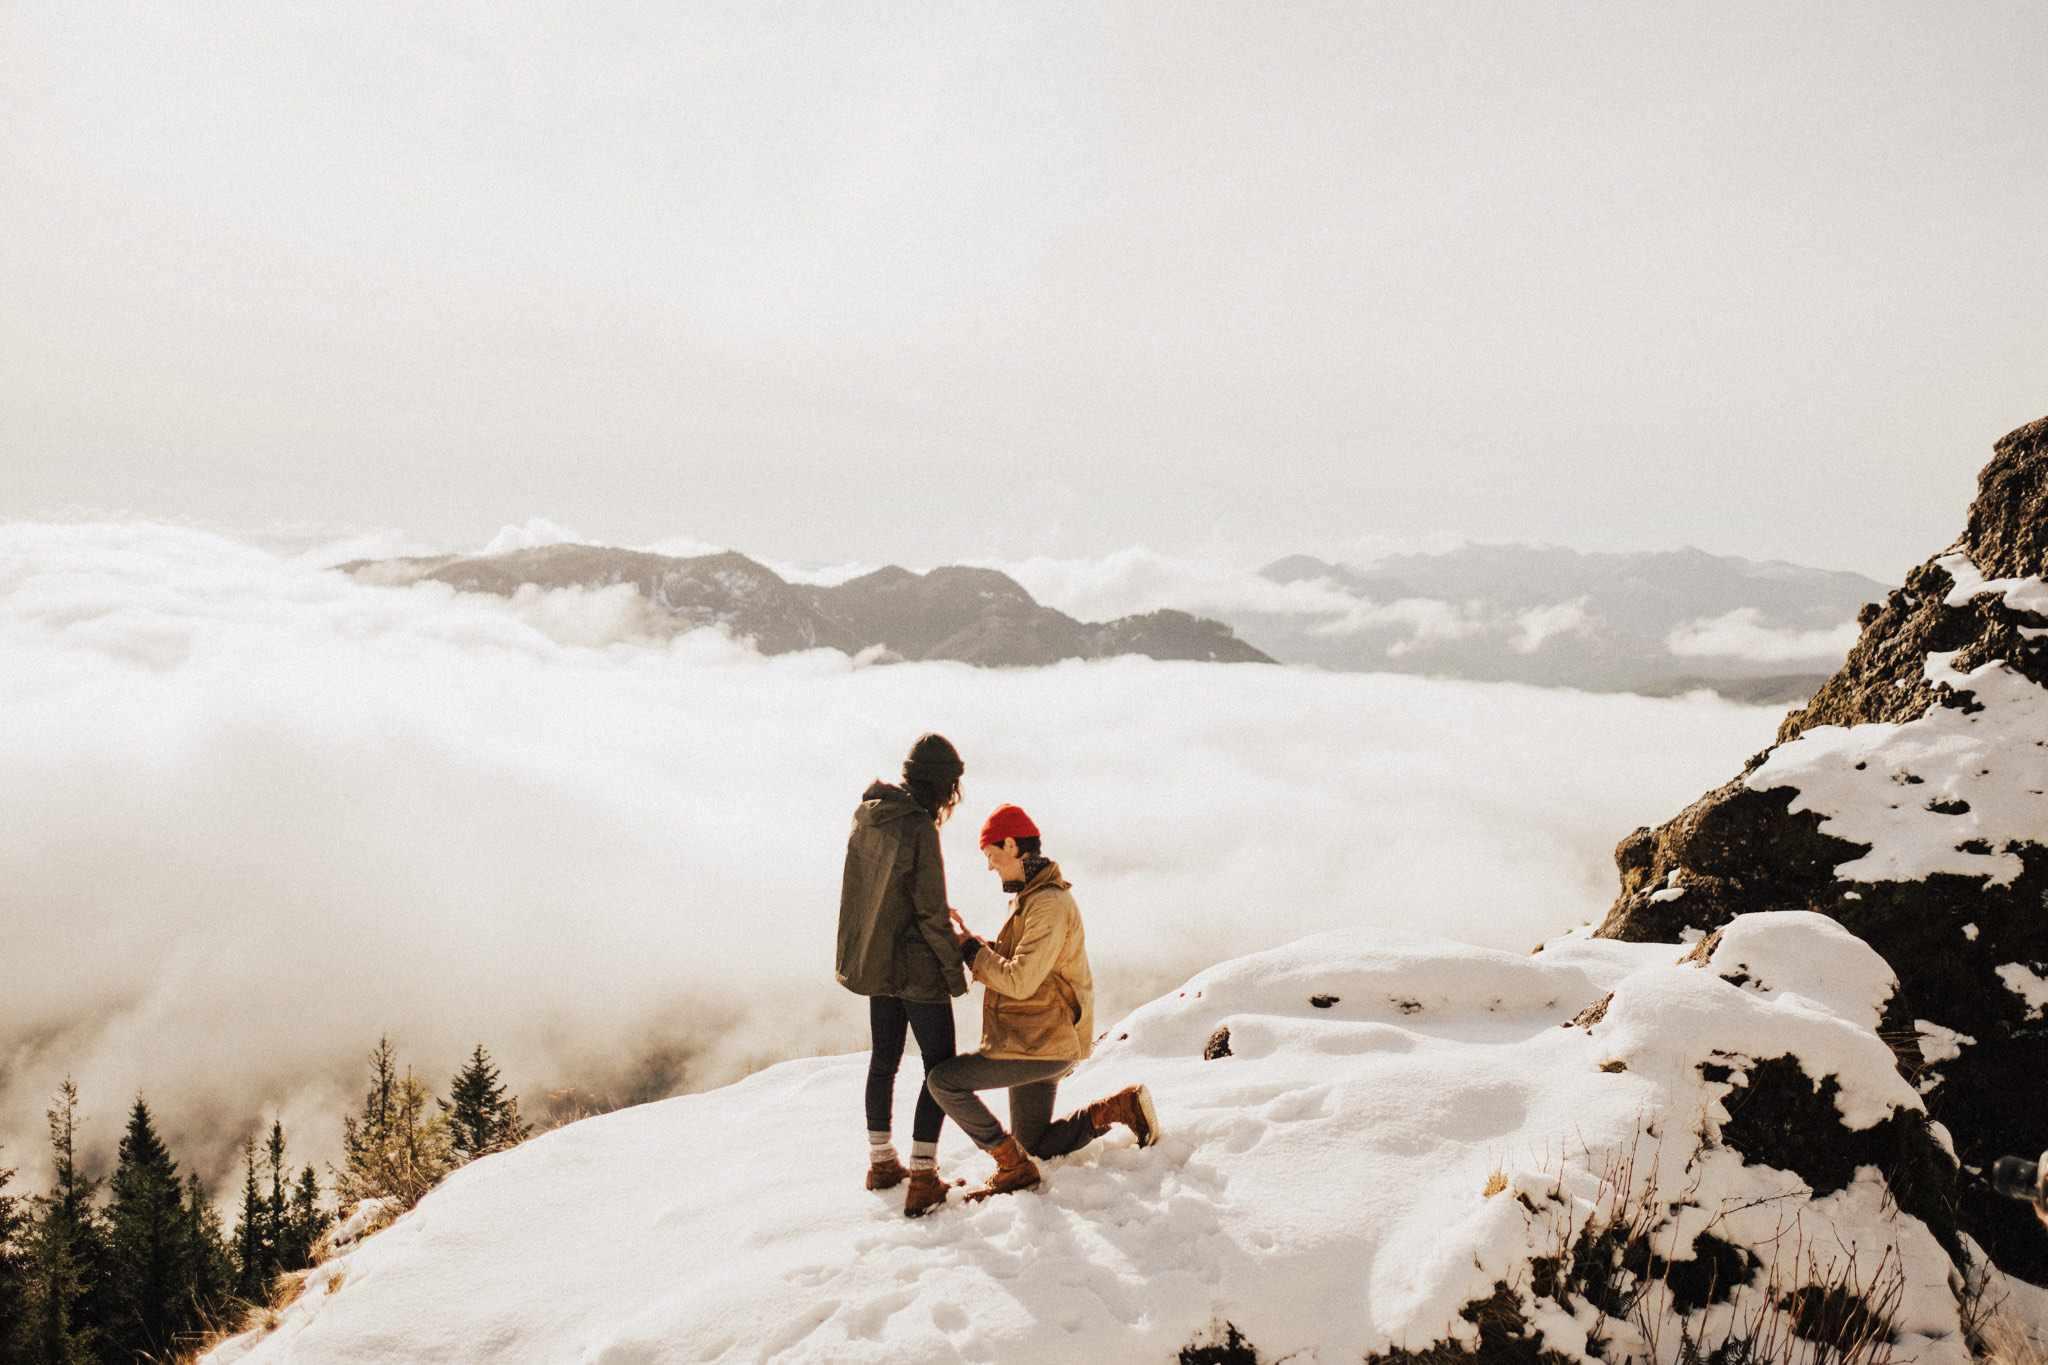 Proposal on a Snowy Mountain